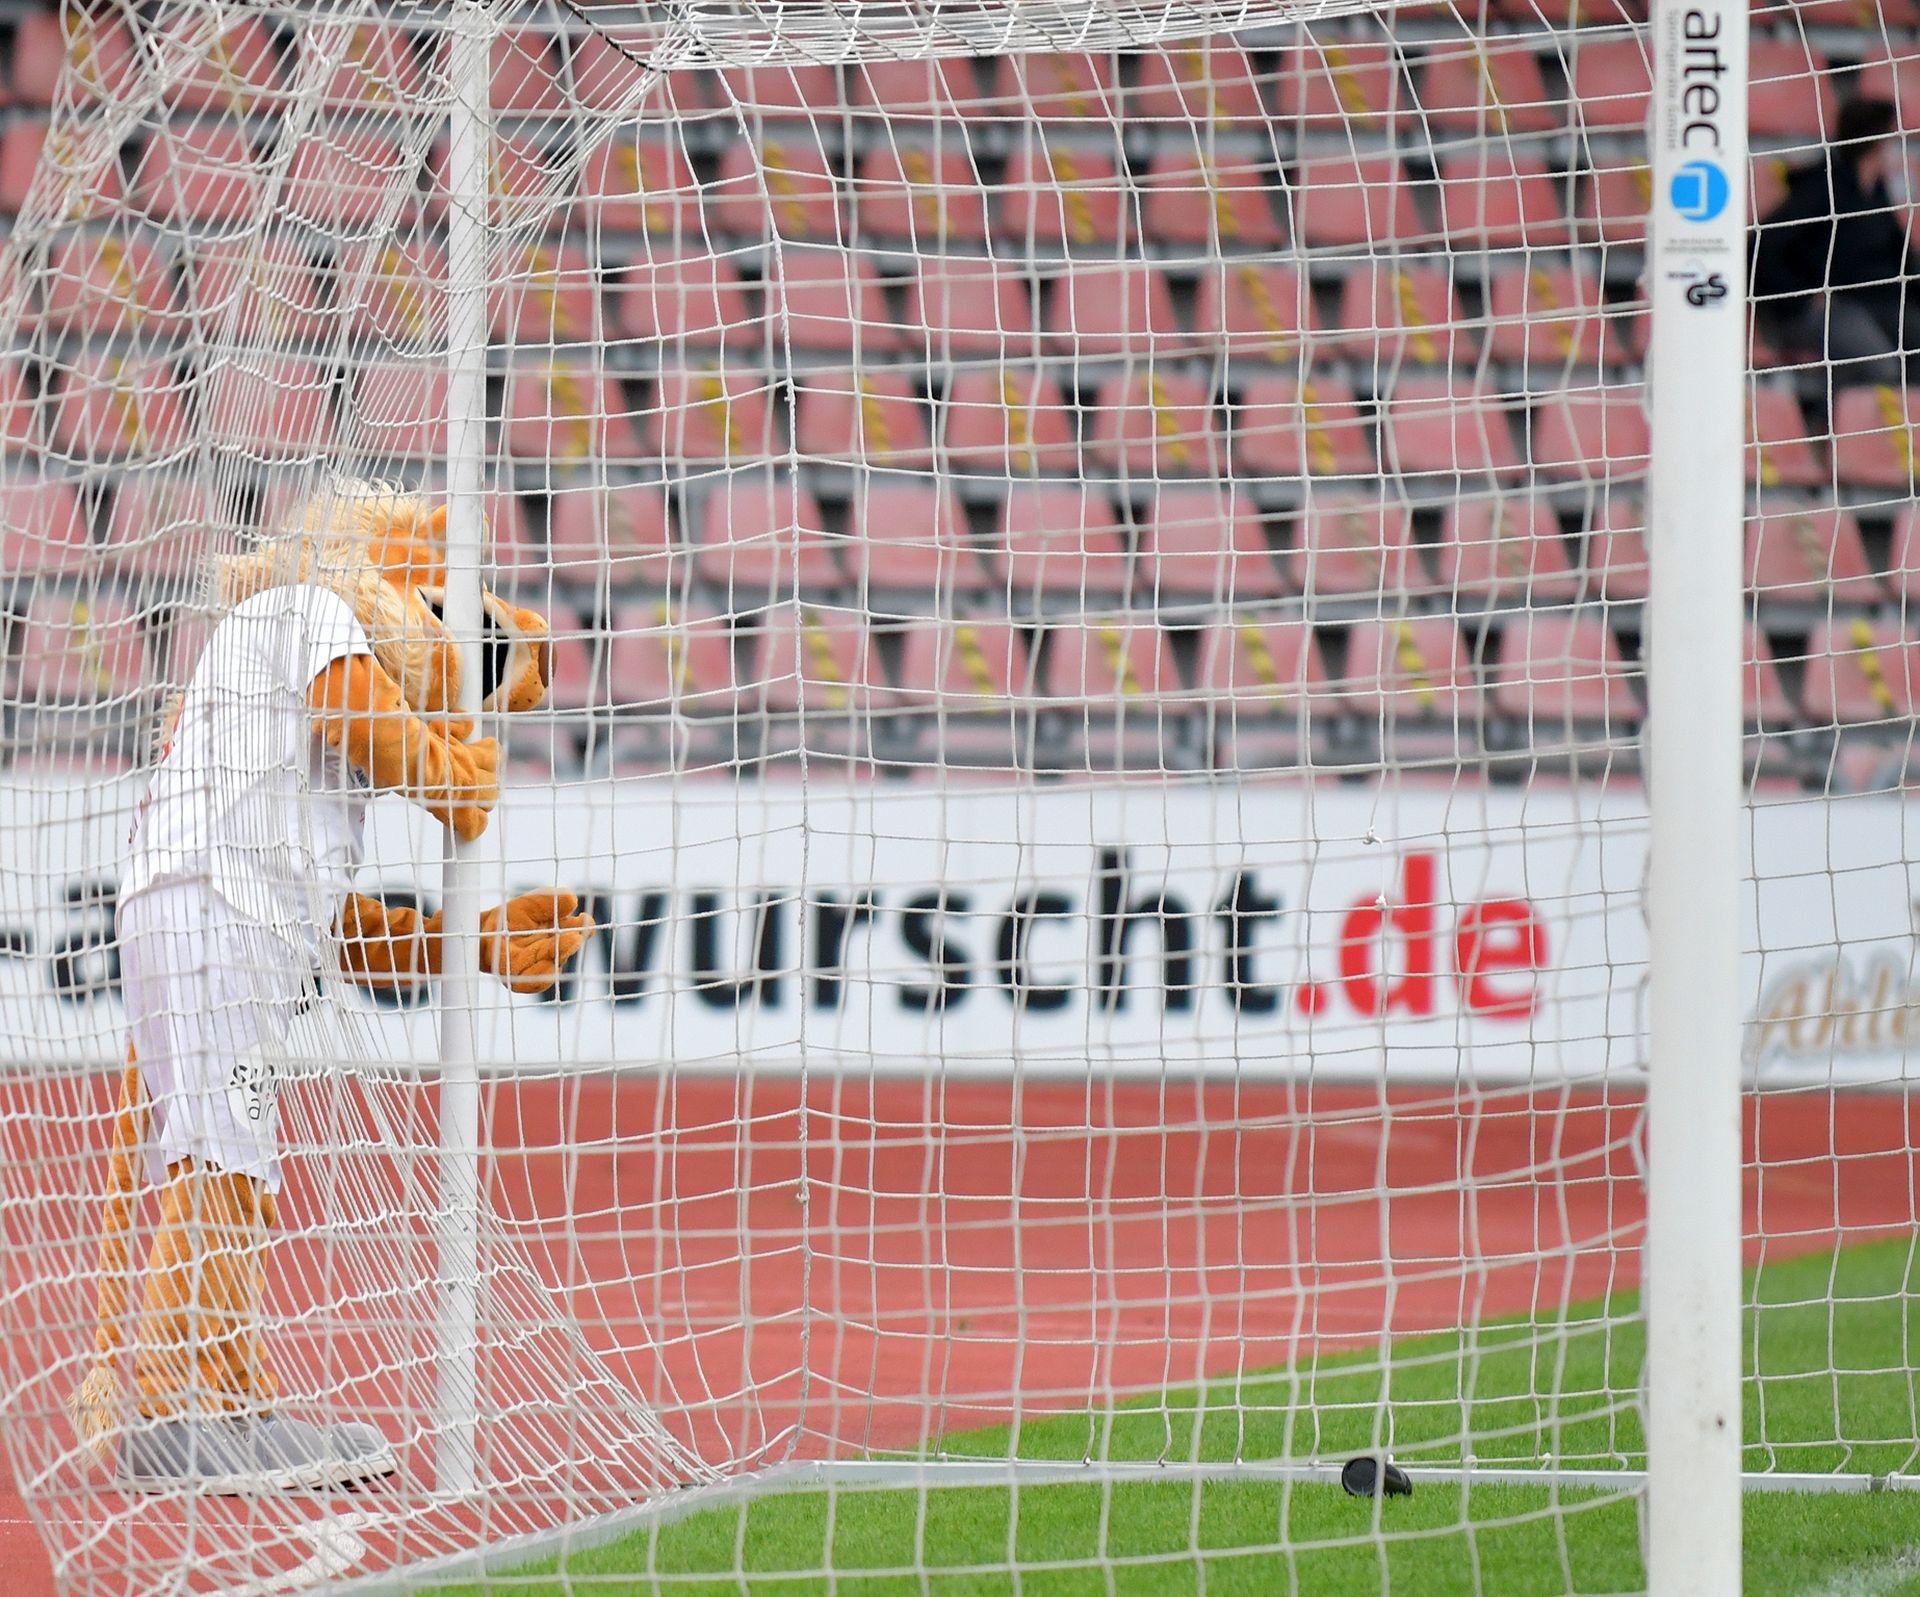 Regionalliga Südwest 2020/21, KSV Hessen Kassel, Rot-Weiss-Koblenz, Endstand 1:1, Totti, Tor